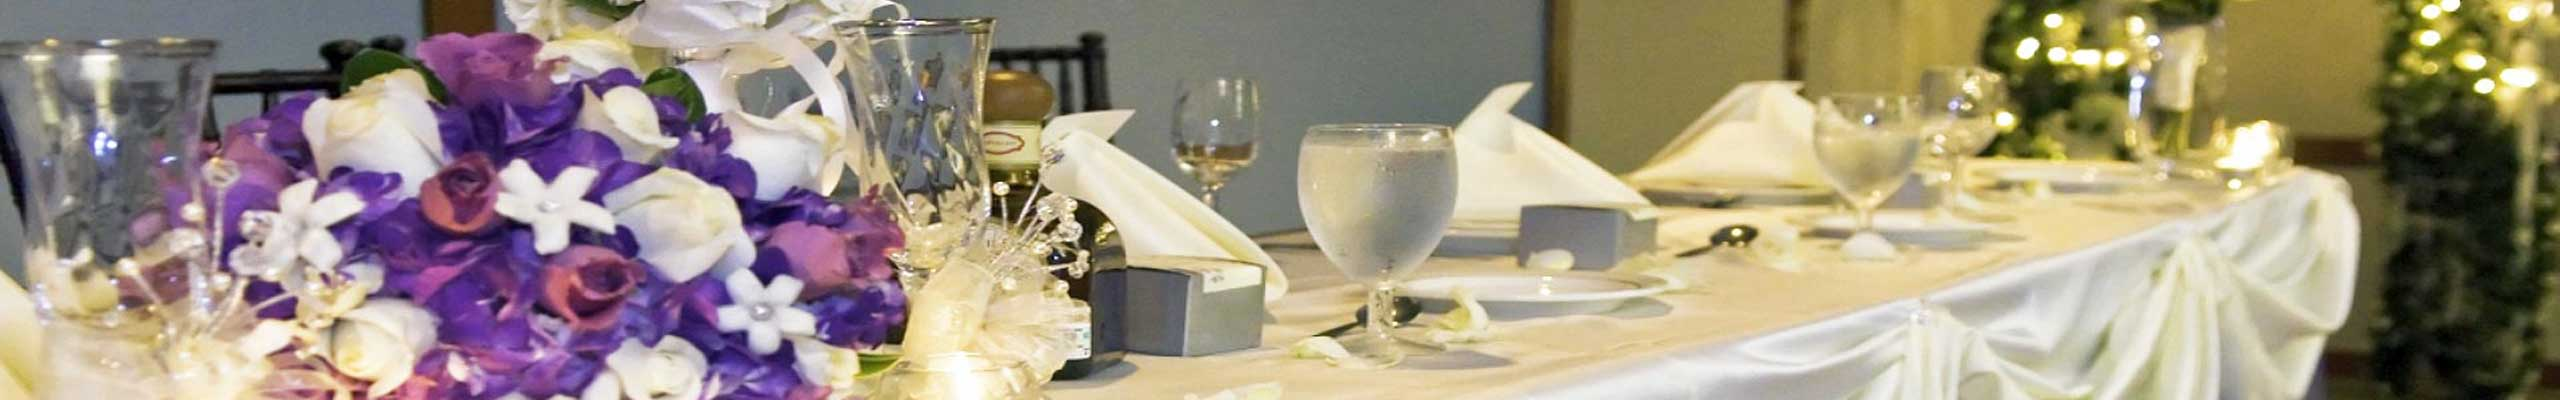 banner-banquet